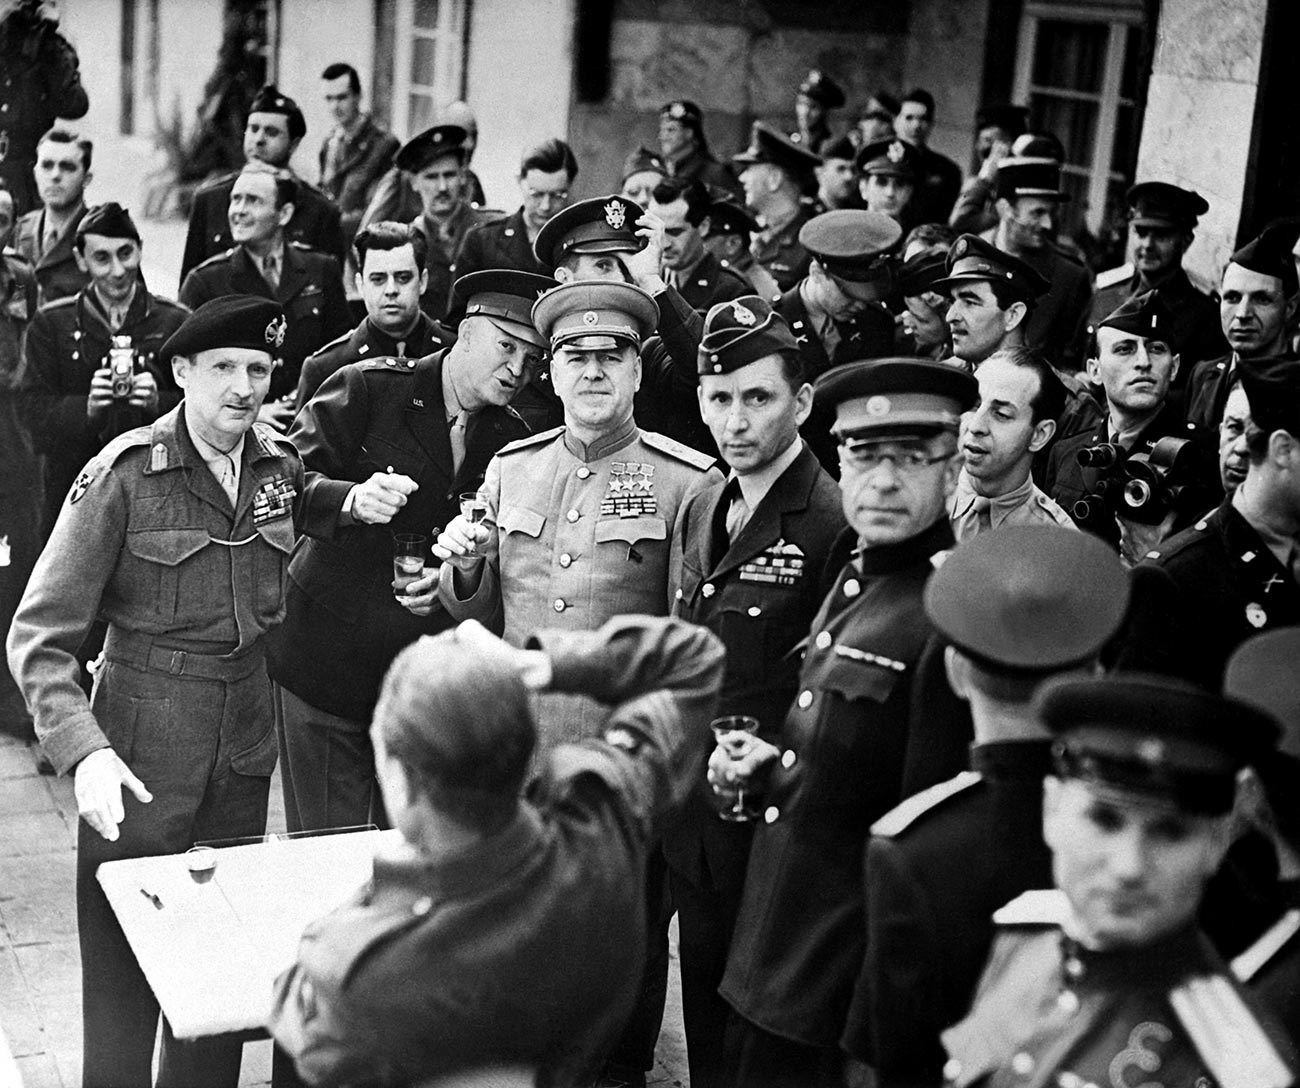 Britanski feldmaršal Bernard Montgomery (lijevo s beretkom) nagrađen Ordenom pobjede 5. lipnja 1945. Desno od Montgomeryja su američki general Dwight Eisenhower i sovjetski maršal Georgij Žukov, također nagrađeni Ordenom pobjede. Desno od Žukova je britanski maršal RAF-a, sir Arthur Teder.